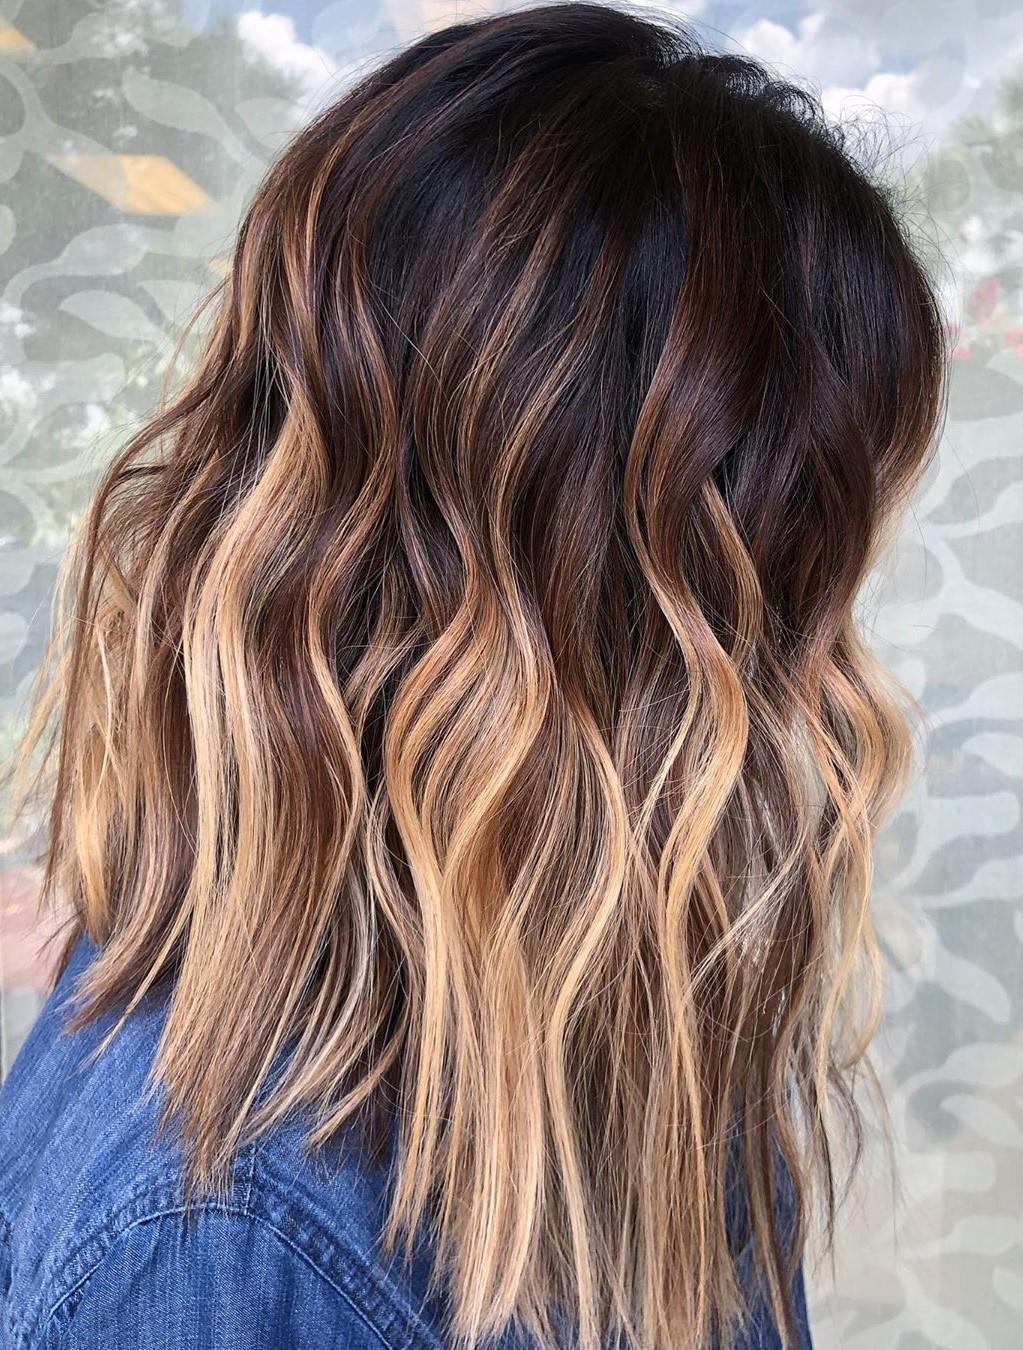 Caramel Blonde Highlights for Medium Hair